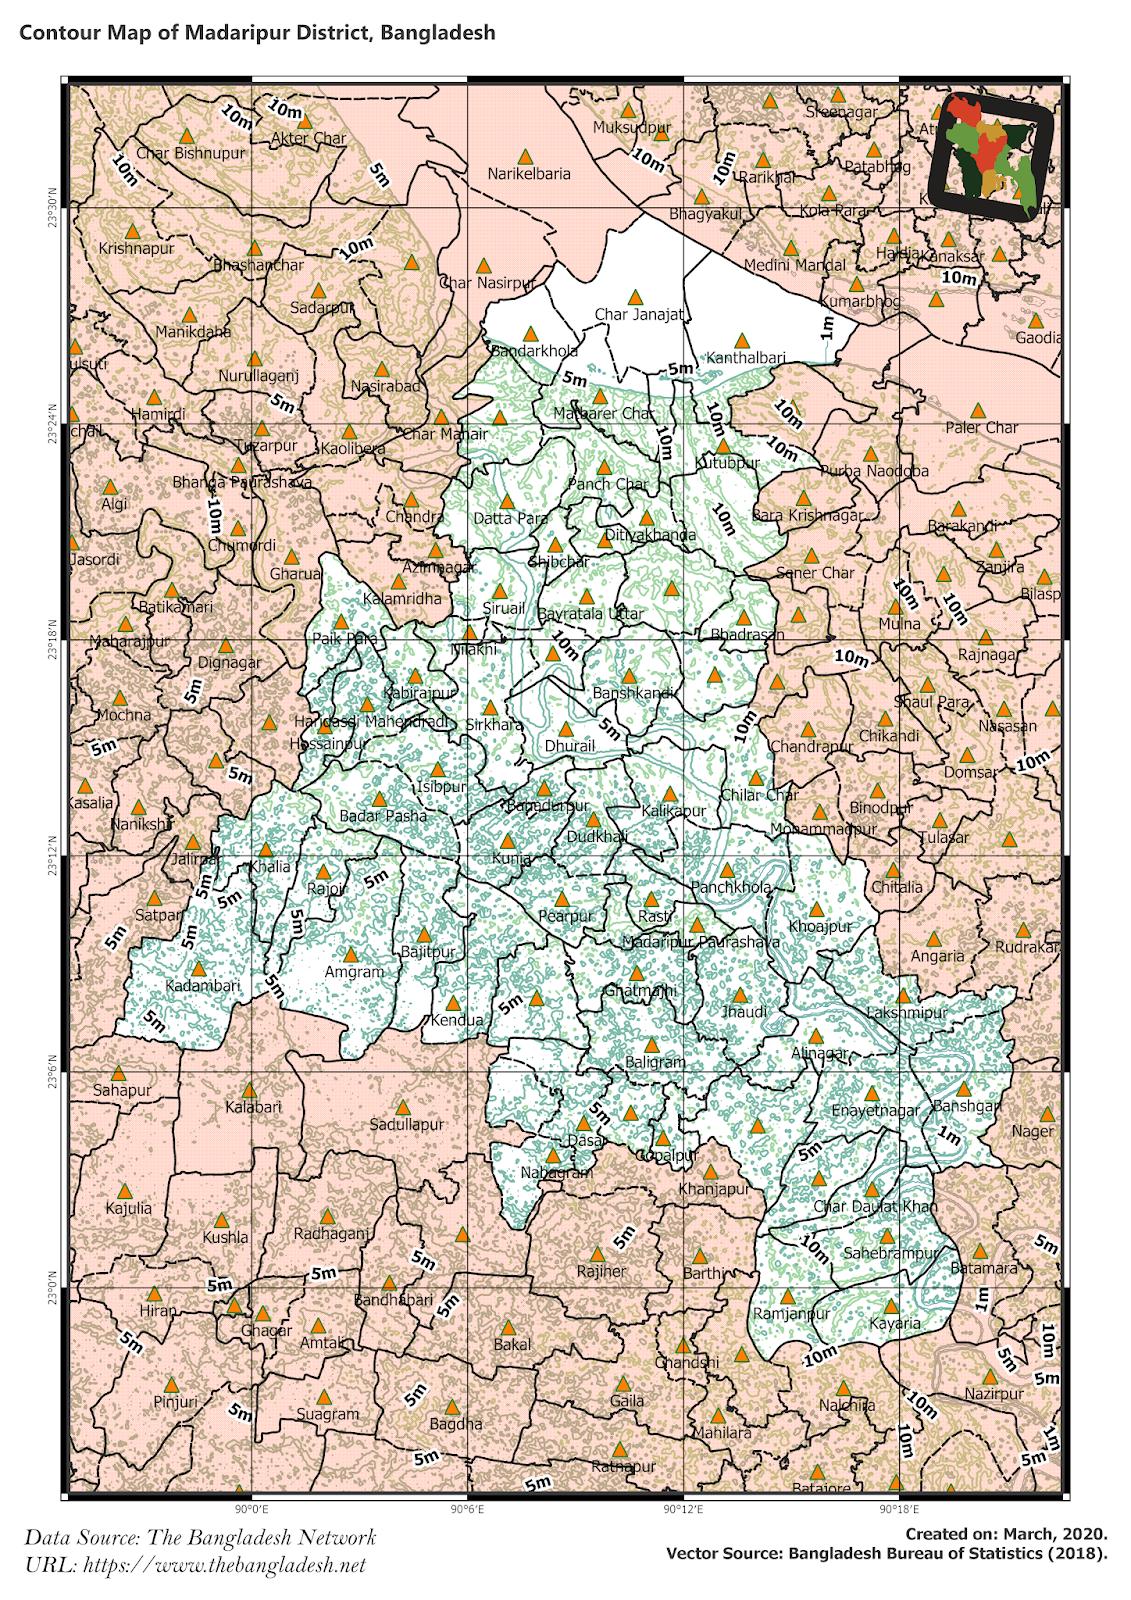 Elevation Map of Madaripur District of Bangladesh